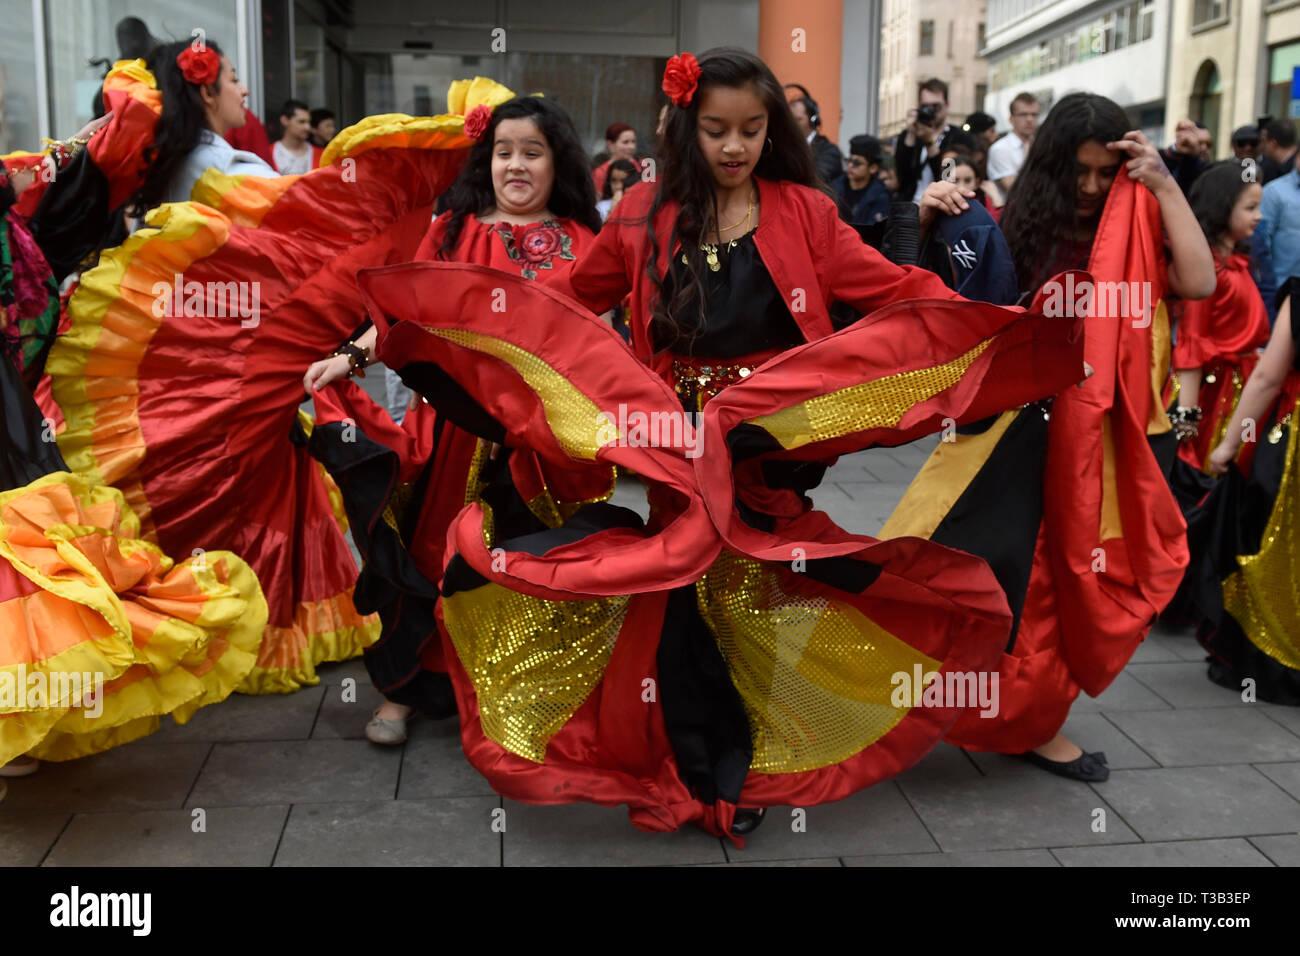 Brno, Czech Republic. 08th Apr, 2019. Girls attend Roma Pride march organised within Week of Roma Culture, on International Romani Day, April 8, 2019, in Brno, Czech Republic. Credit: Vaclav Salek/CTK Photo/Alamy Live News - Stock Image